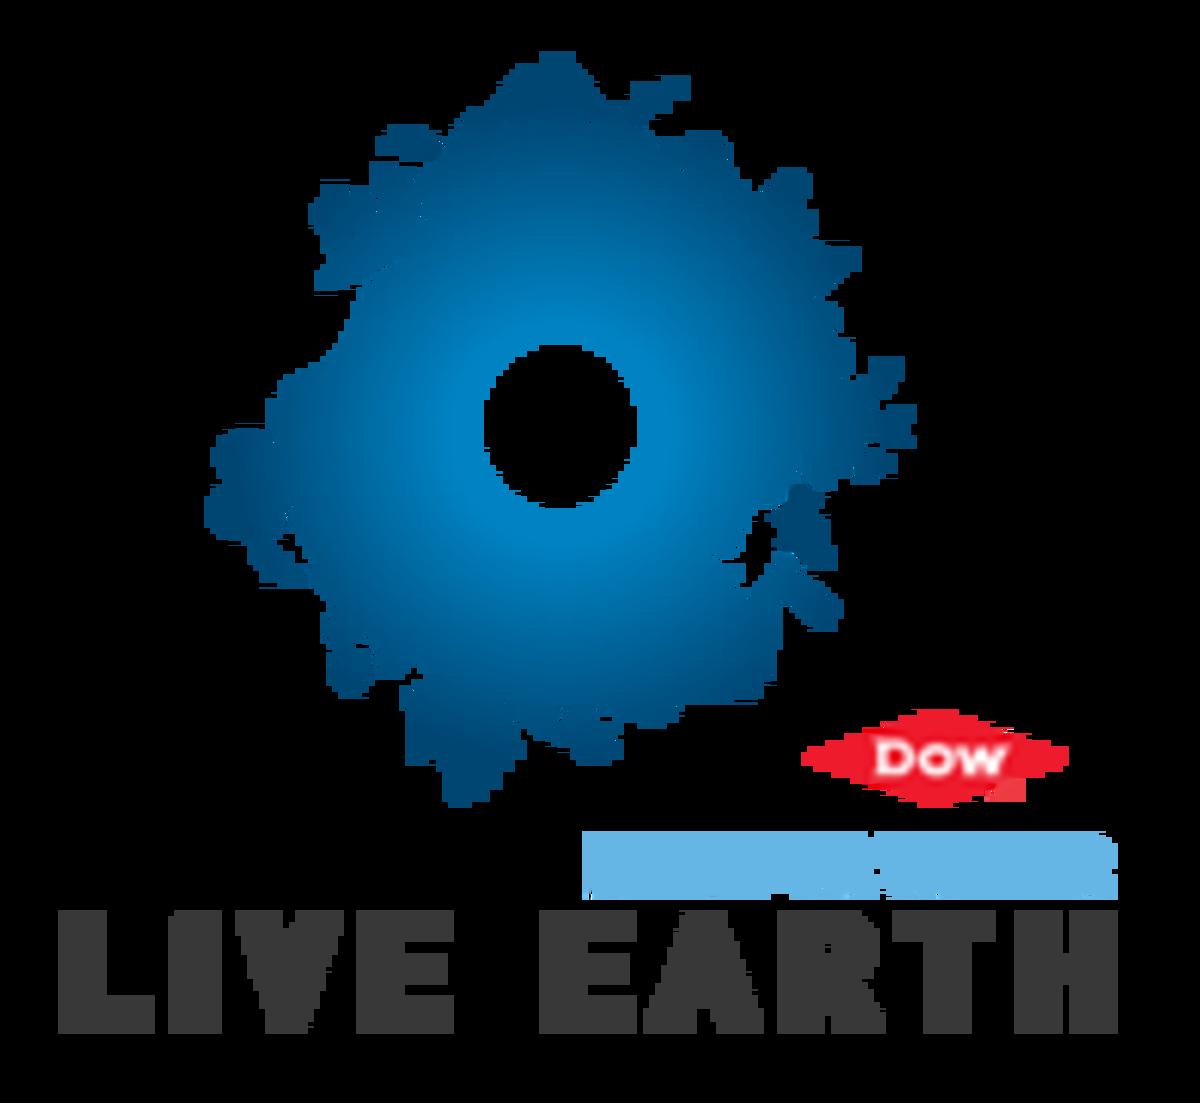 LE_RFW_Dow1